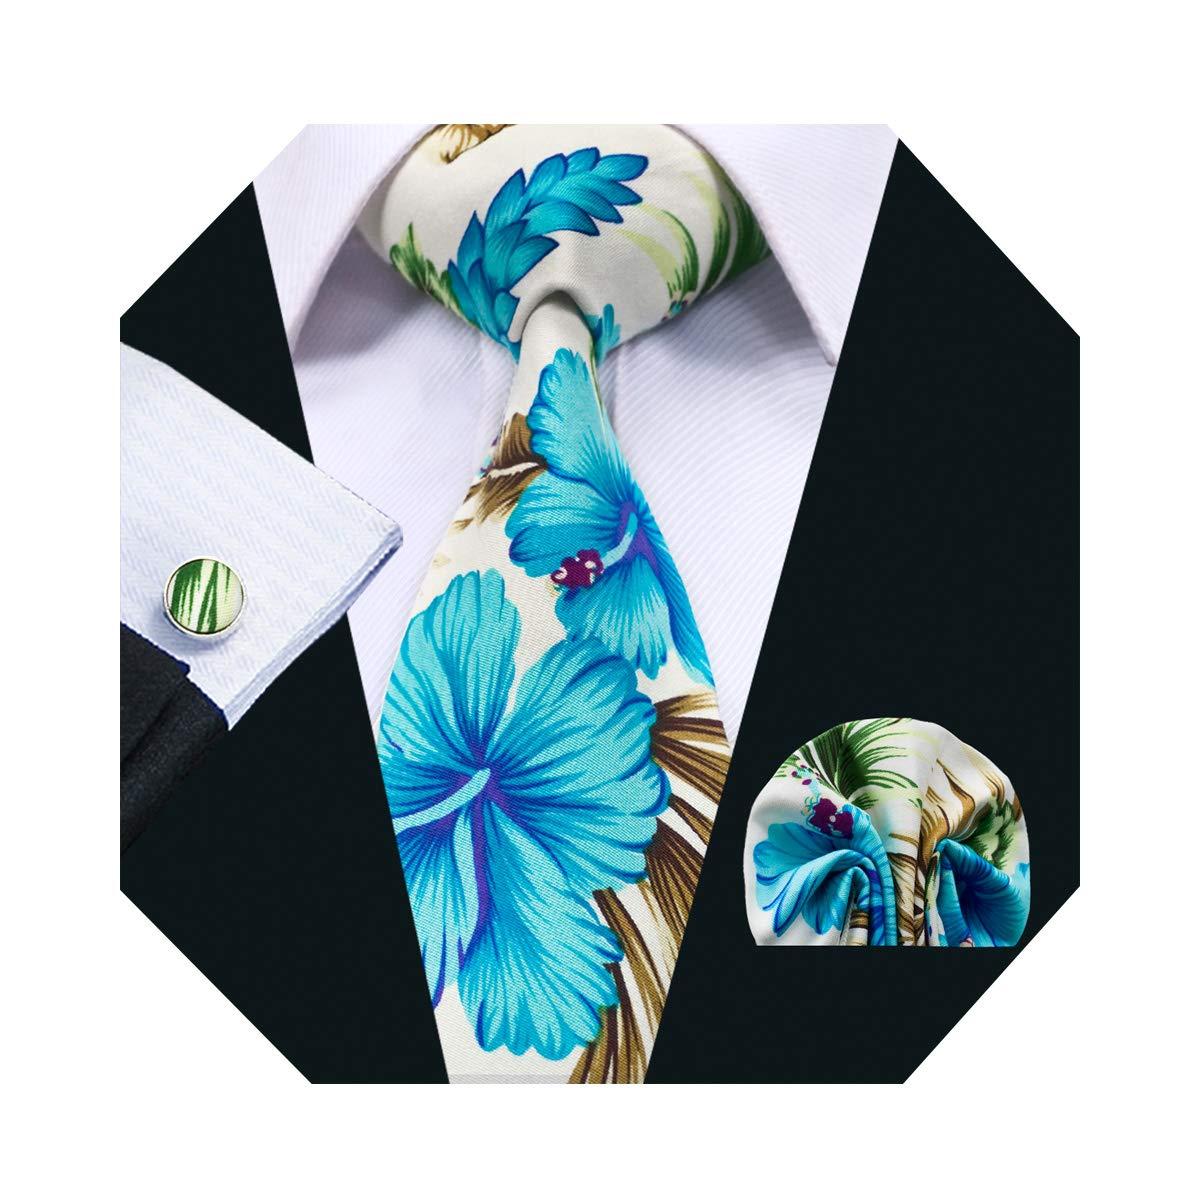 DiBanGu Cotton Necktie Men's Floral Tie and Pocket Square Cufflinks Tie Clip Set Wedding Ties MB-1338